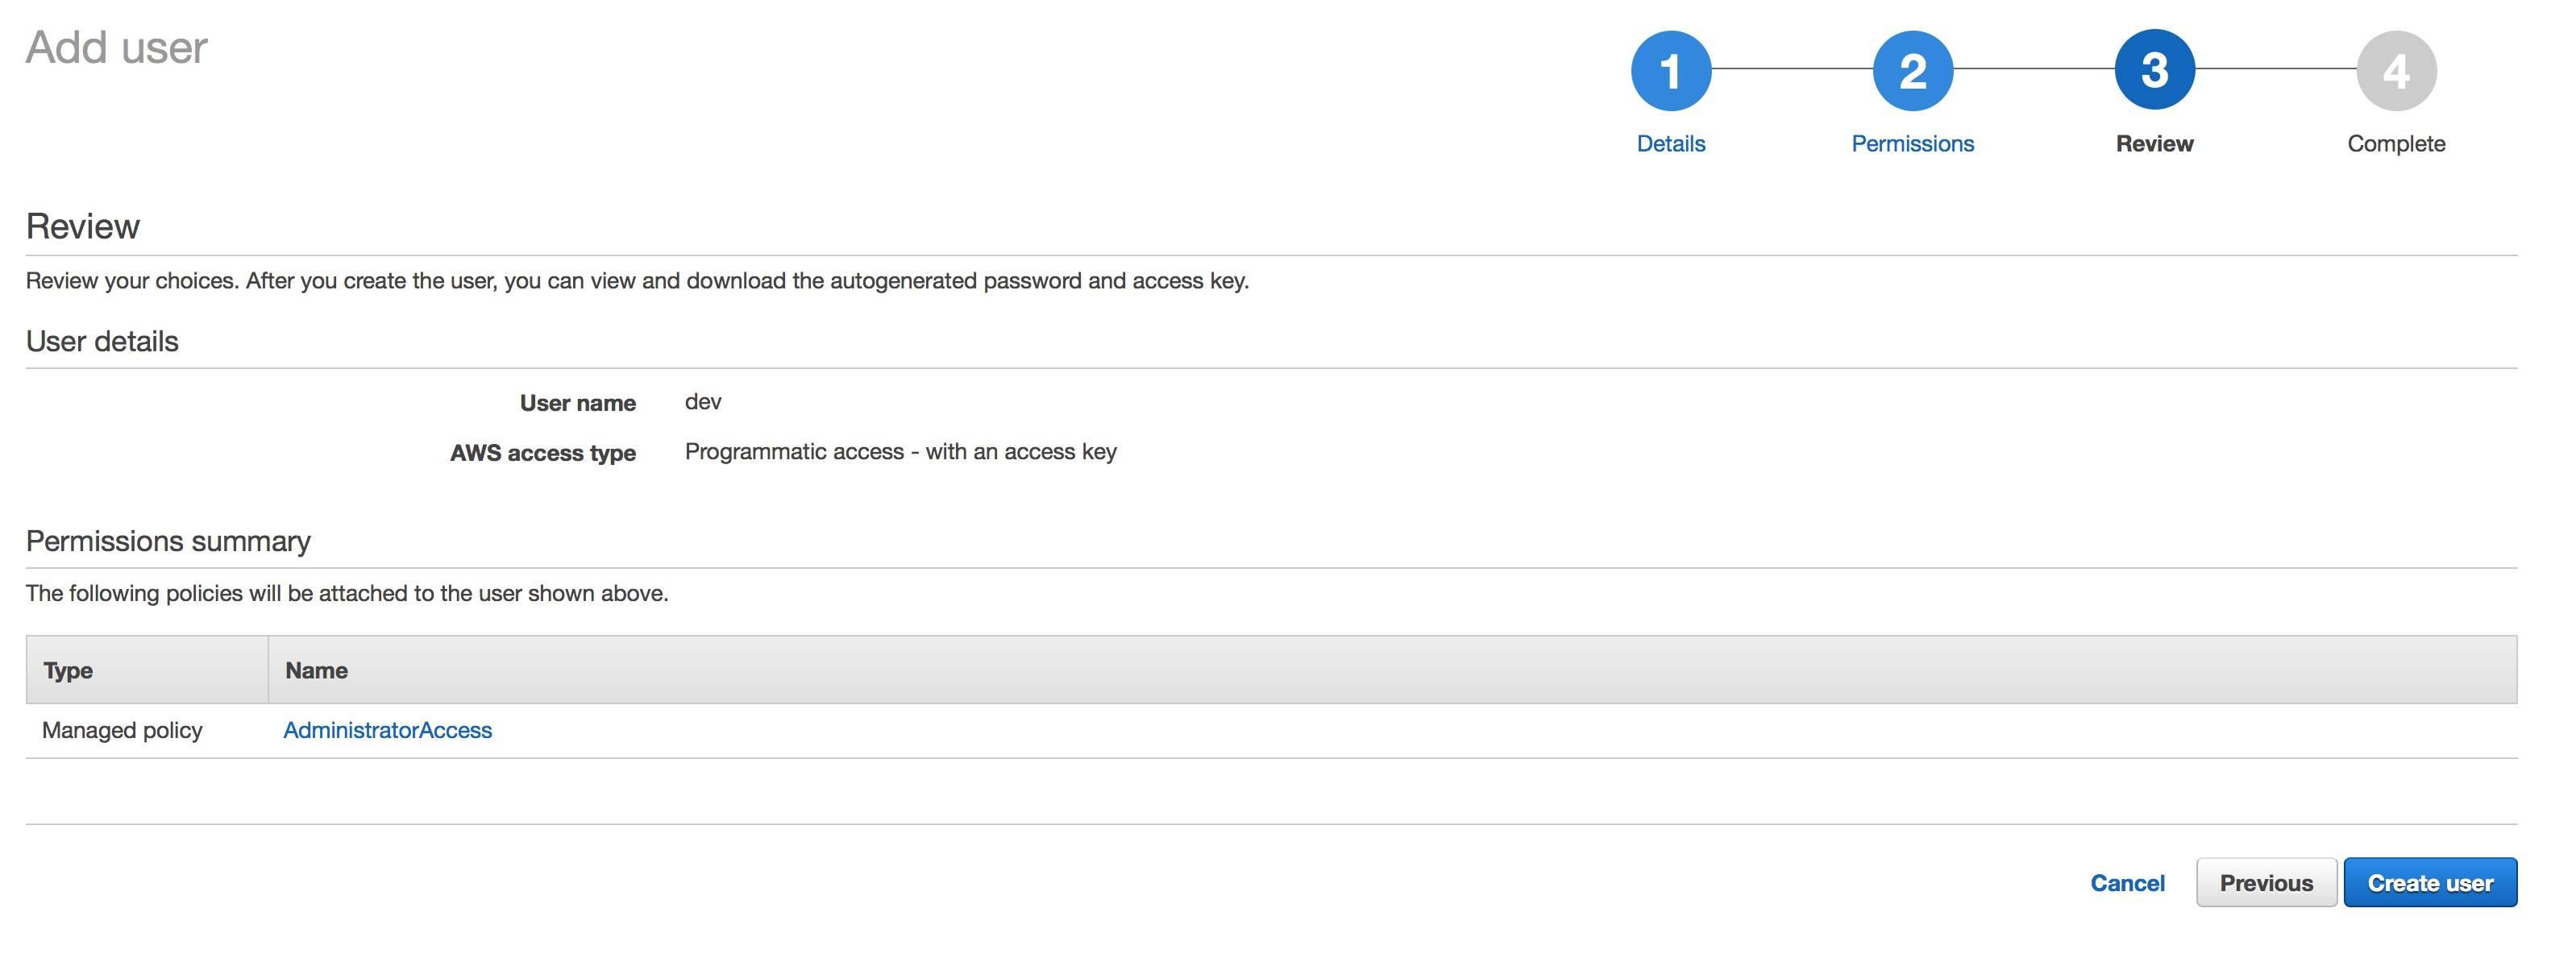 tạo tài khoản iam user programmatic access bước 3